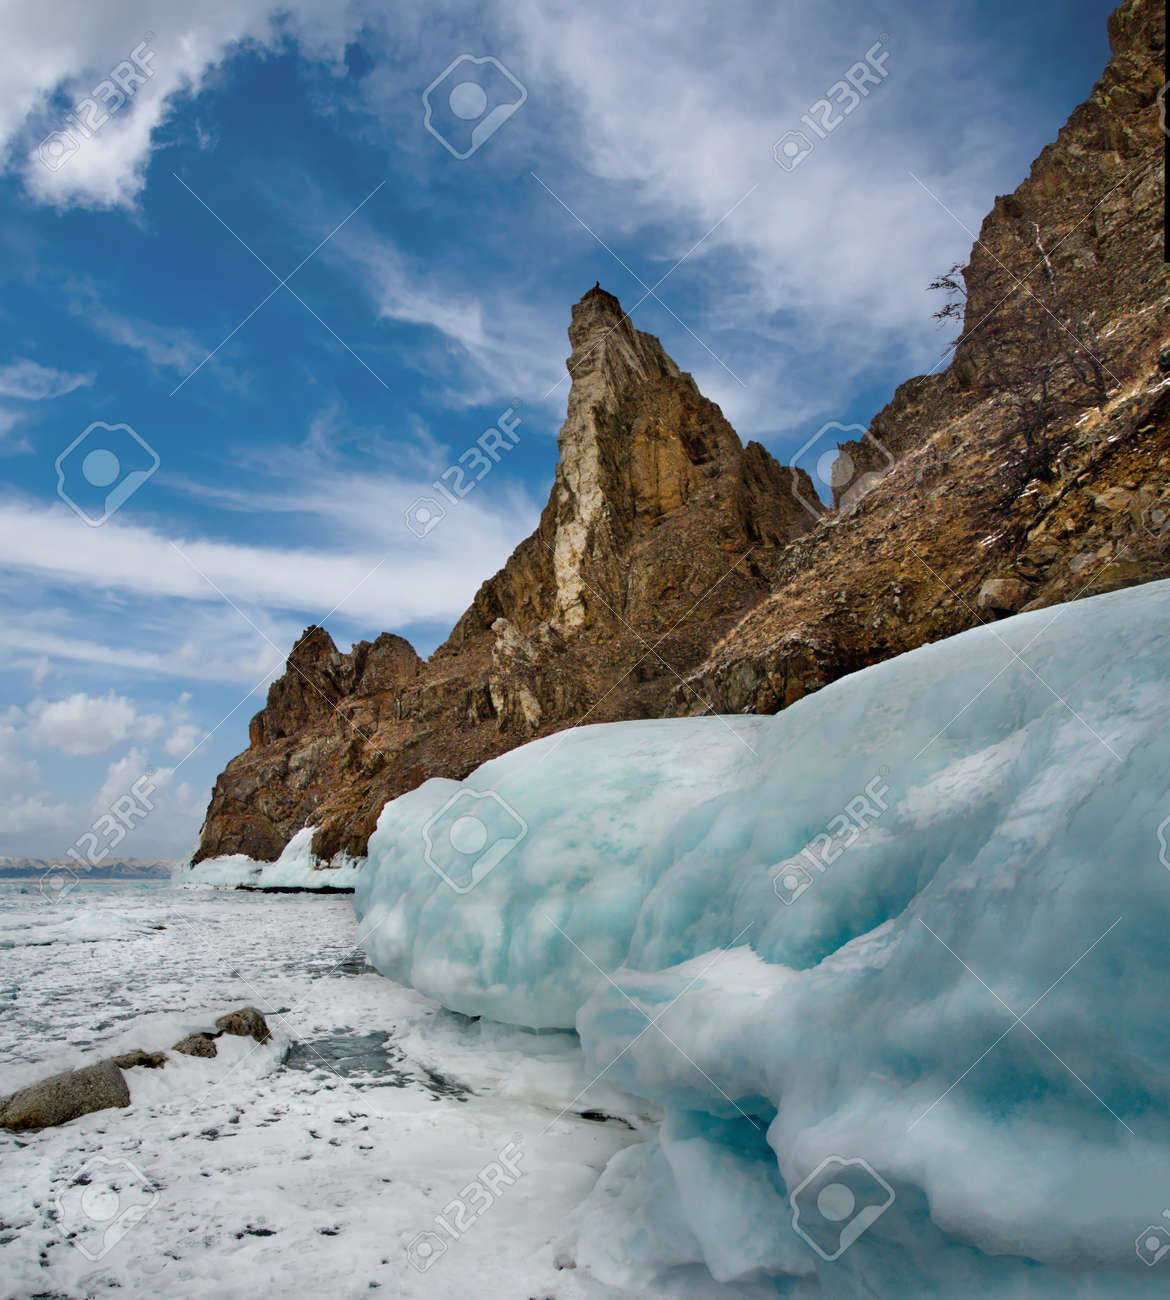 Russia. Fancy icy rocks of lake Baikal. - 157302538